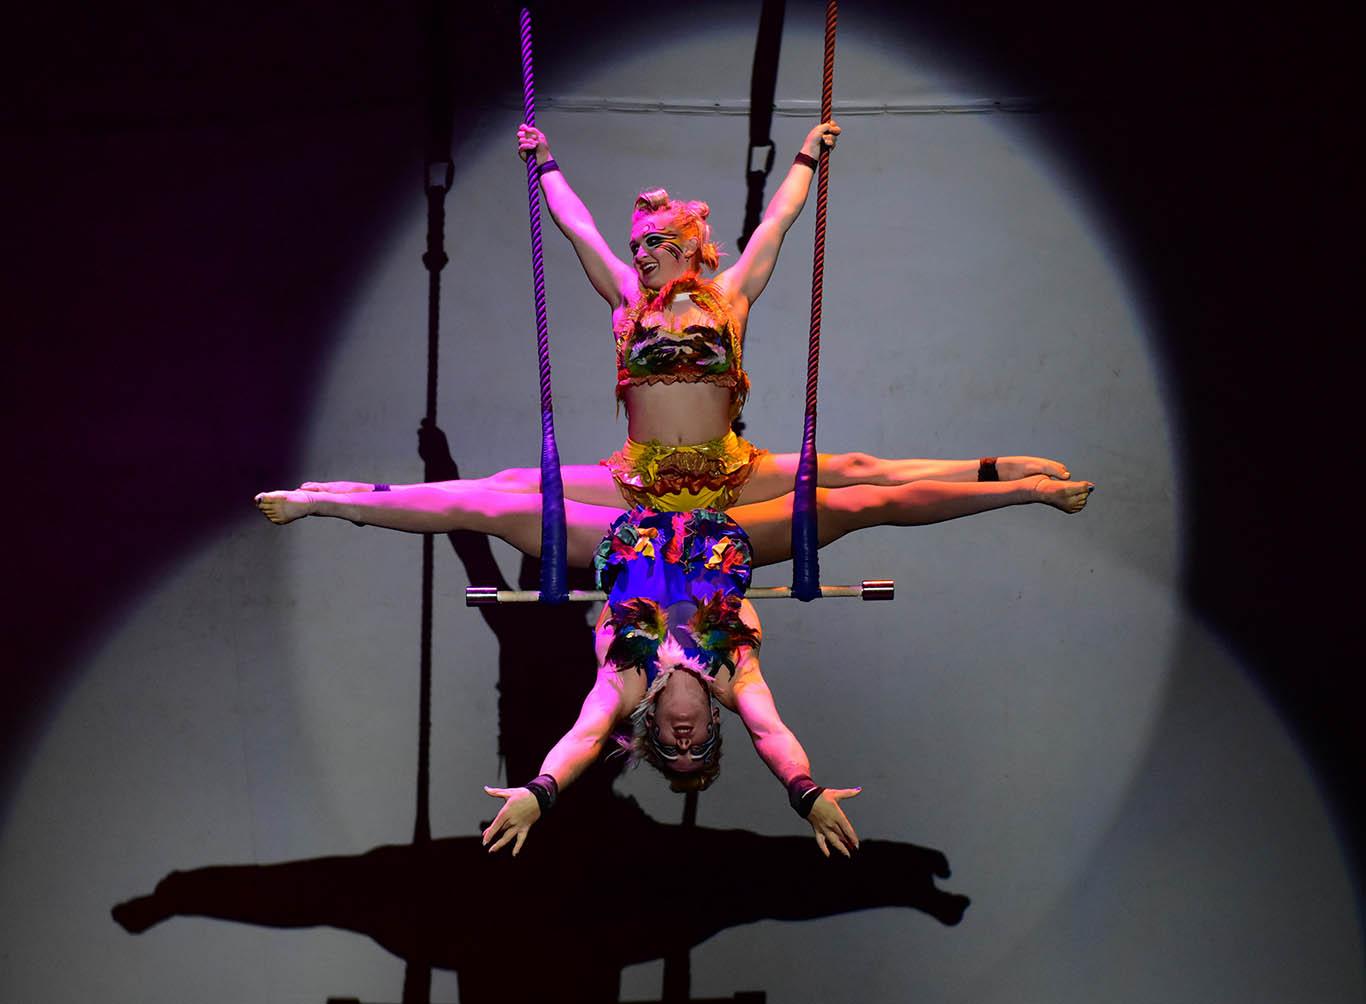 The two jessicas at Karnidale festival - Lunar Circus, Karridale, Margaret River, Australia